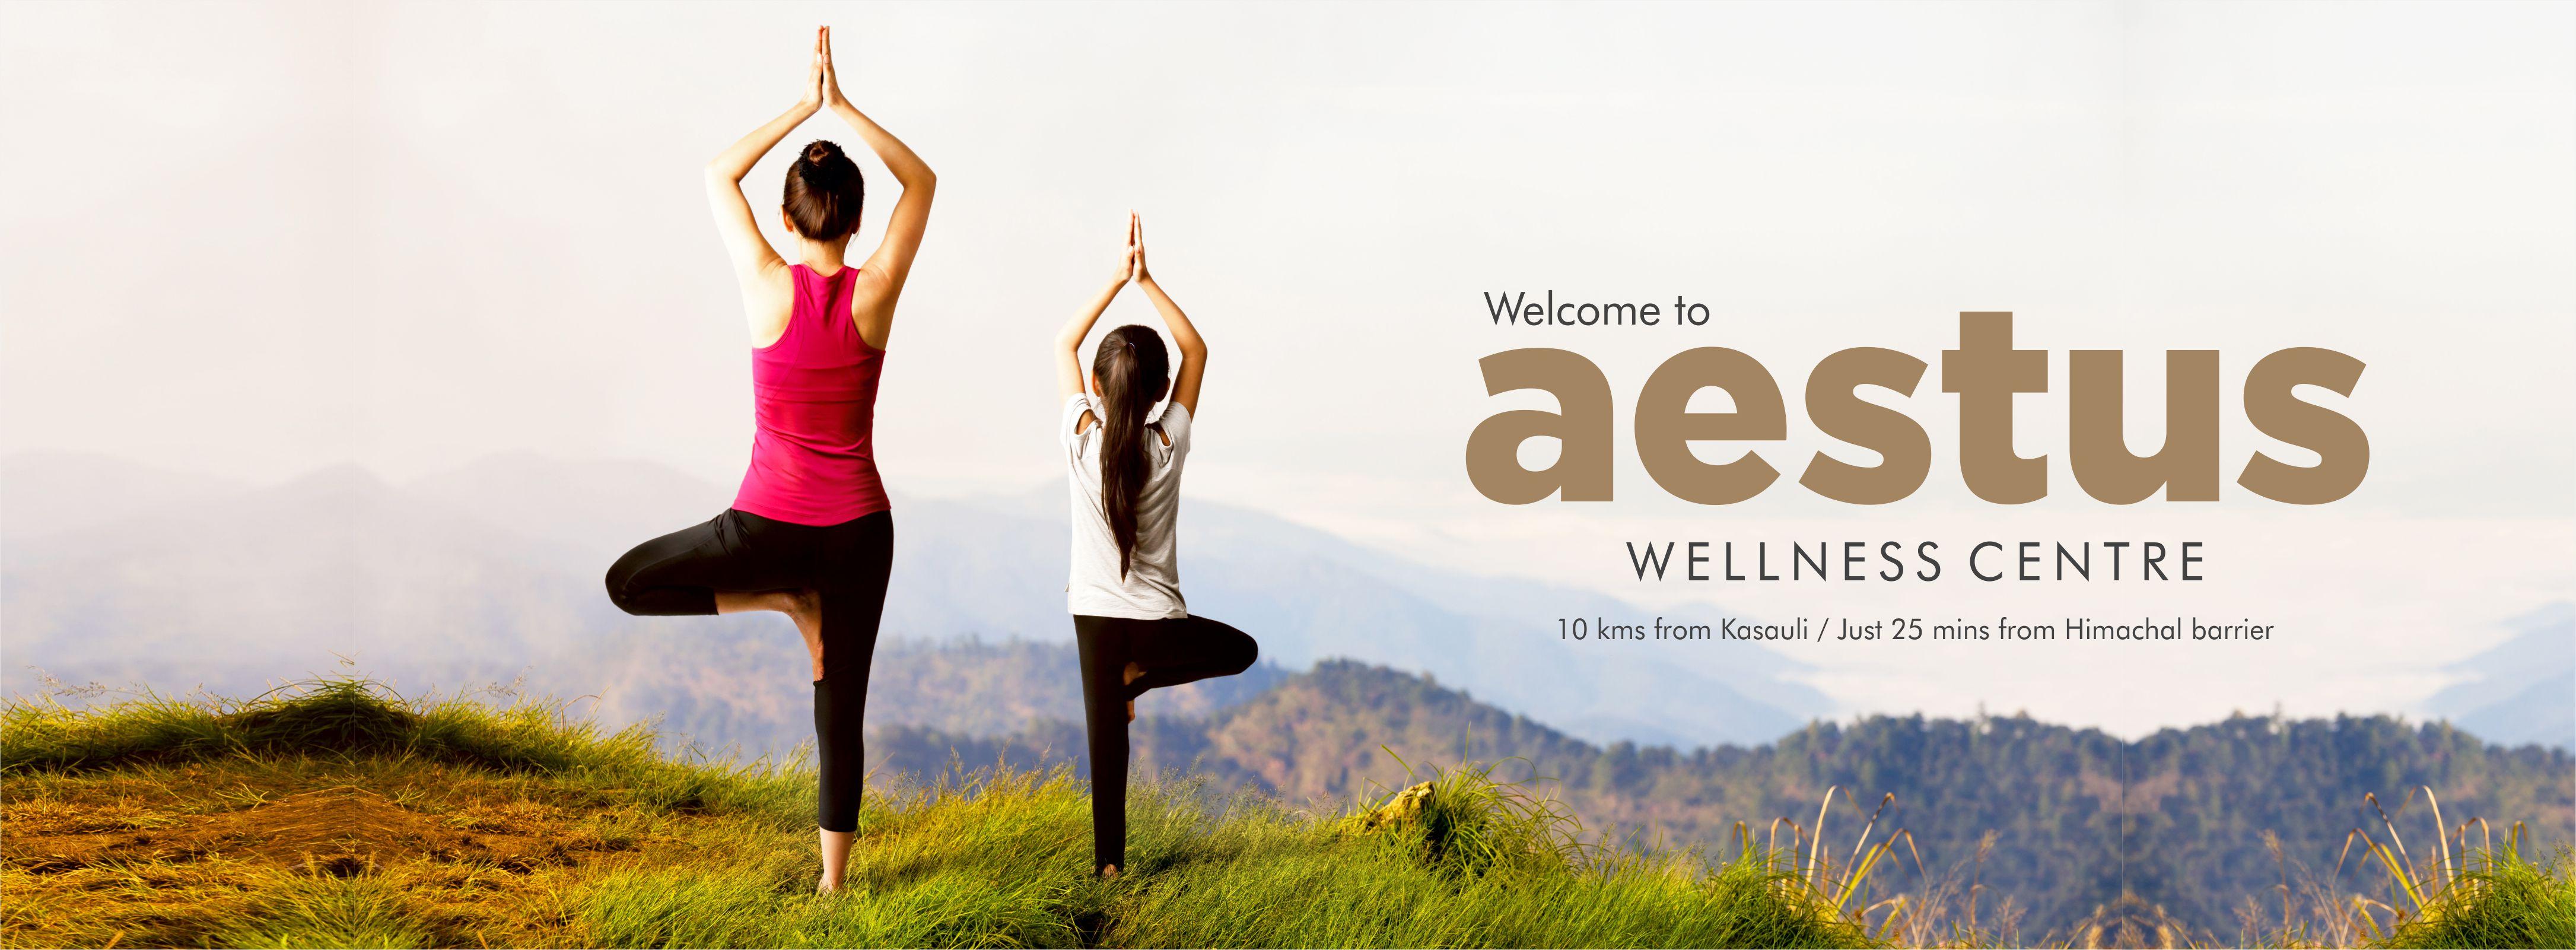 Aestus Wellness Centre Kasauli